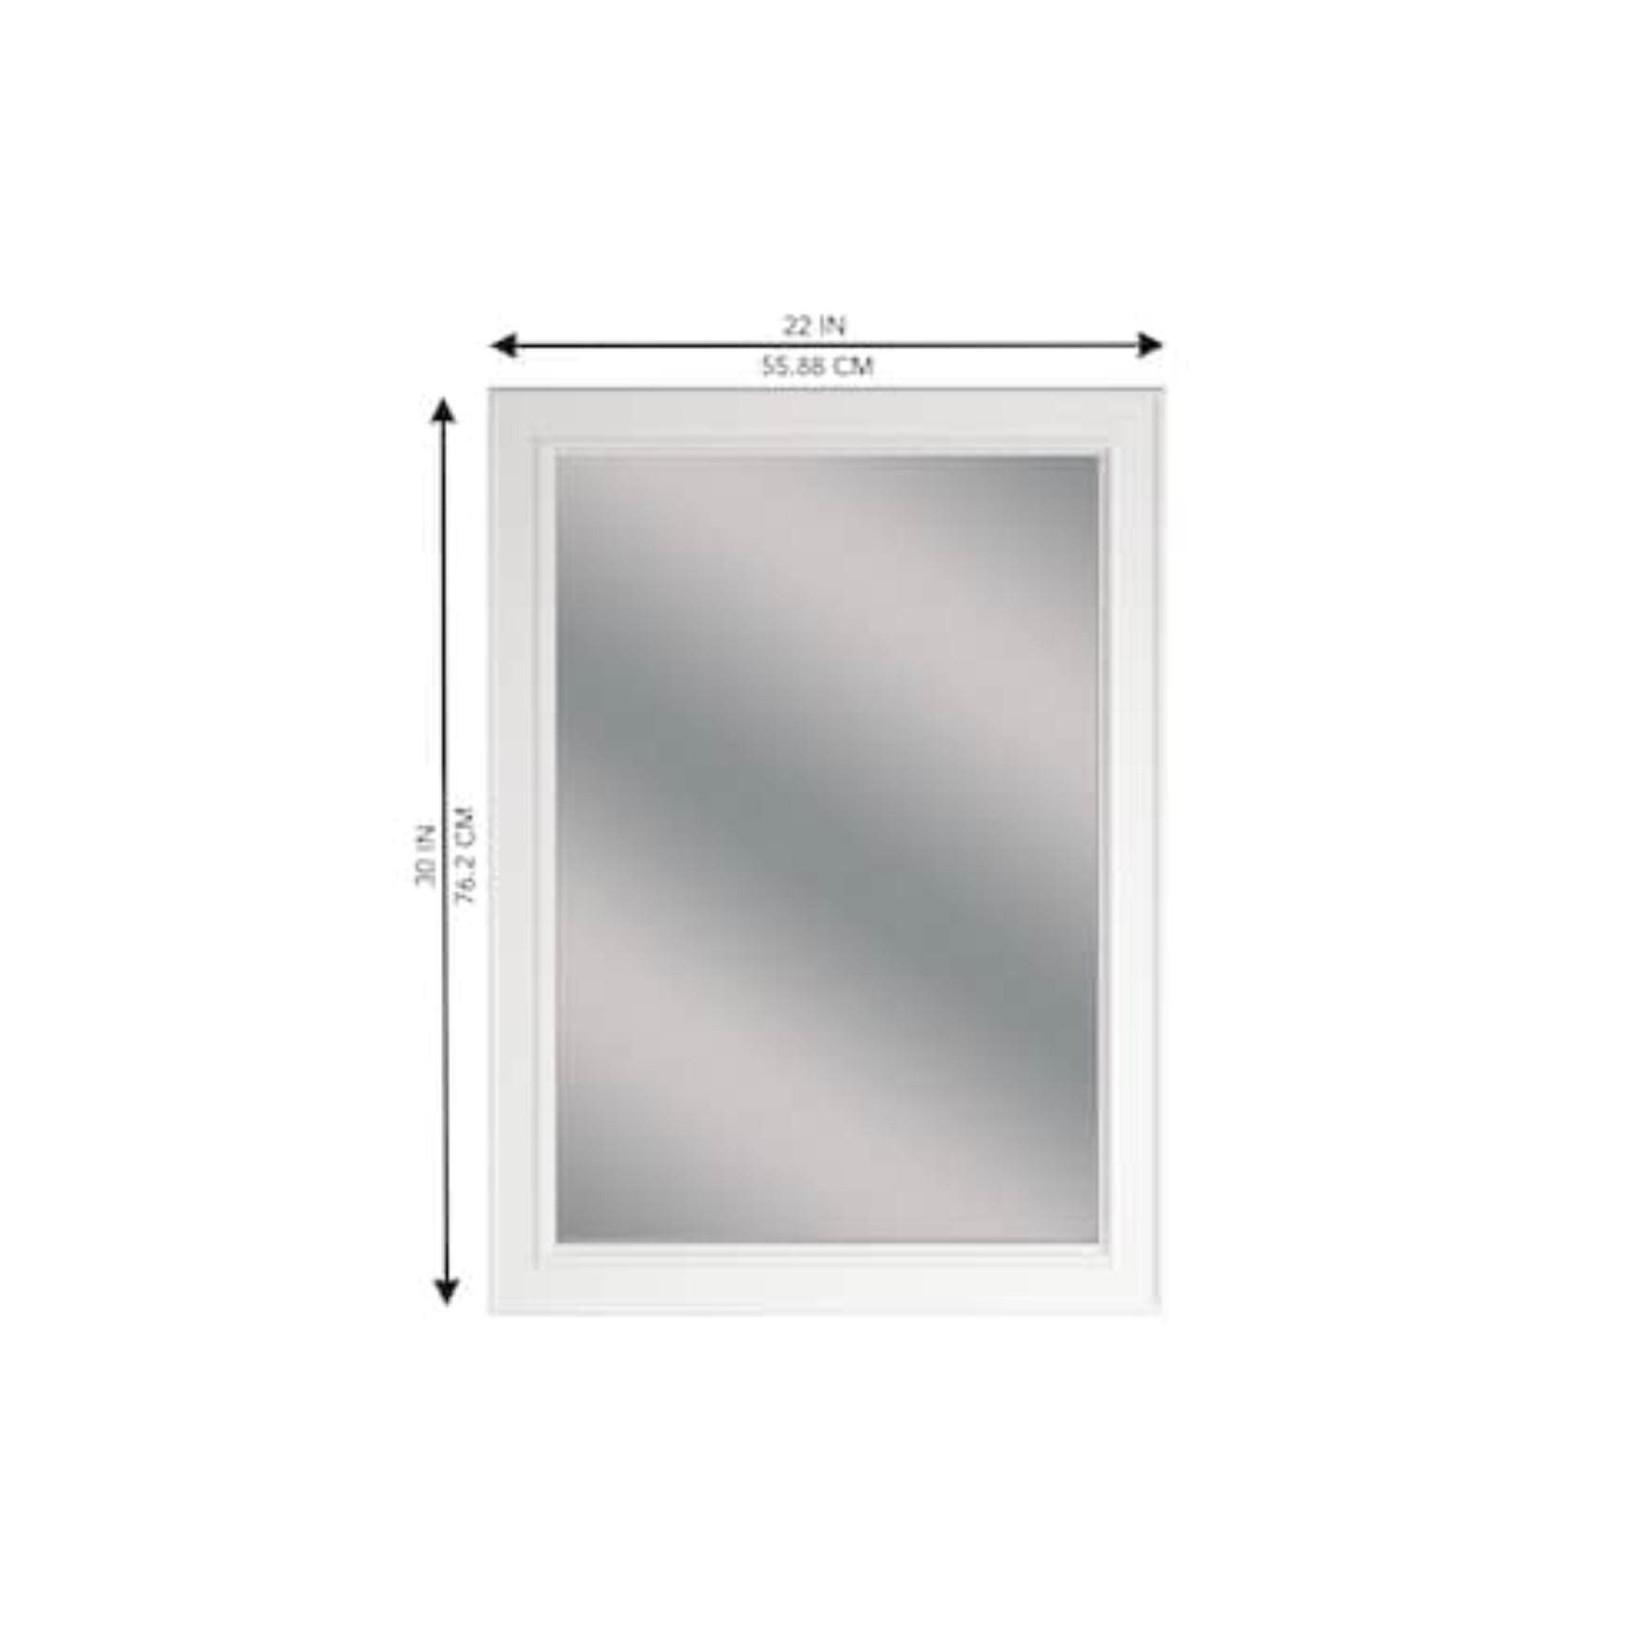 10584 Wrightsville 22-in Bathroom Mirror